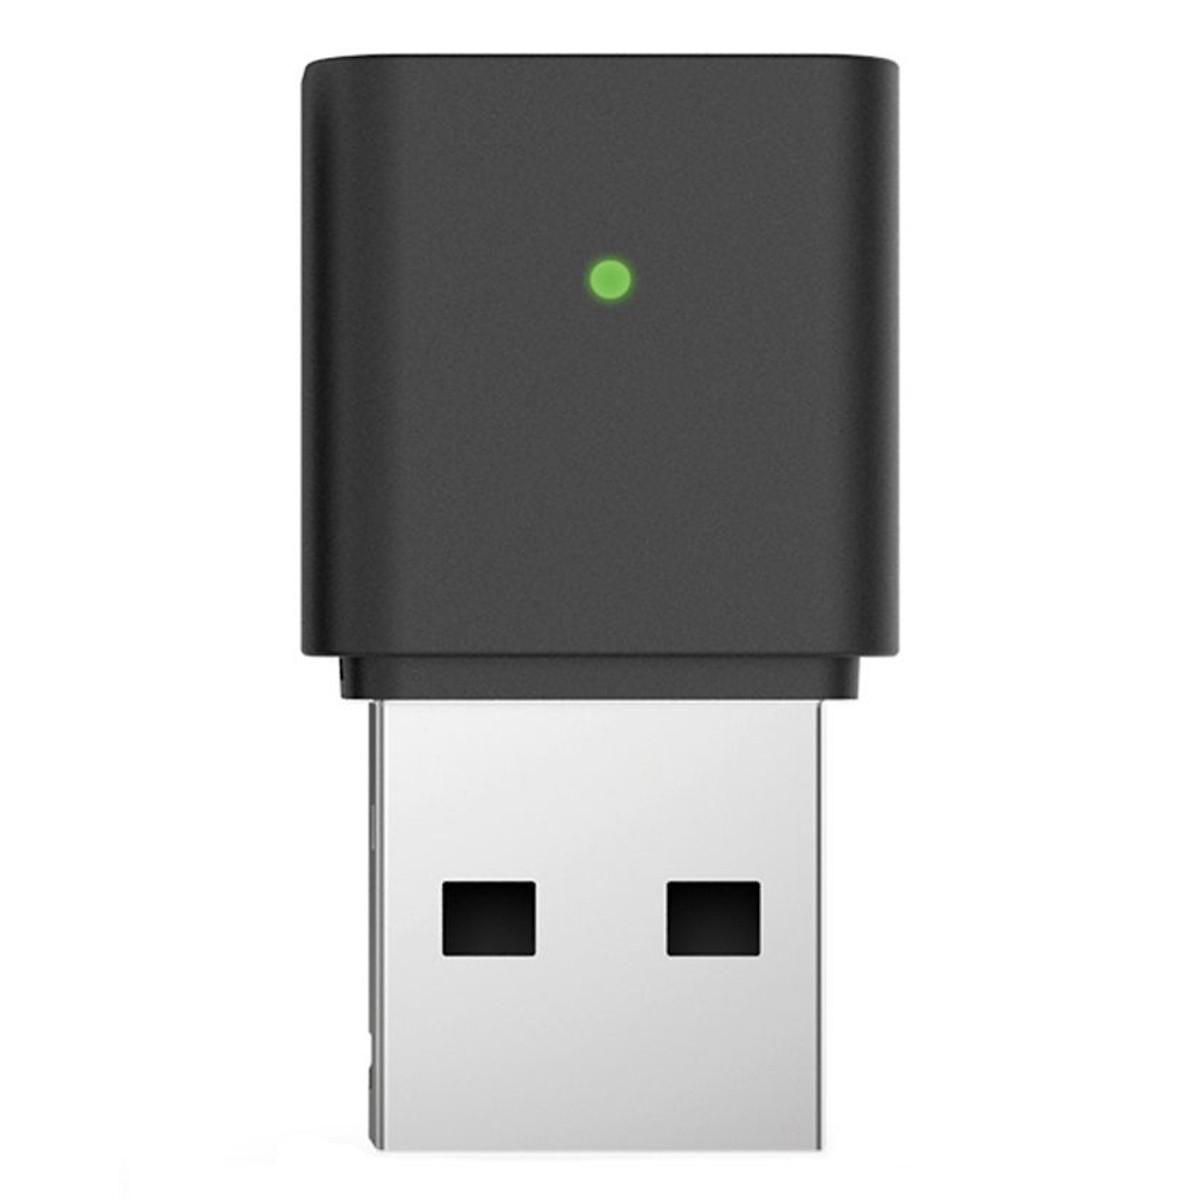 USB wifi D-Link DWA-131